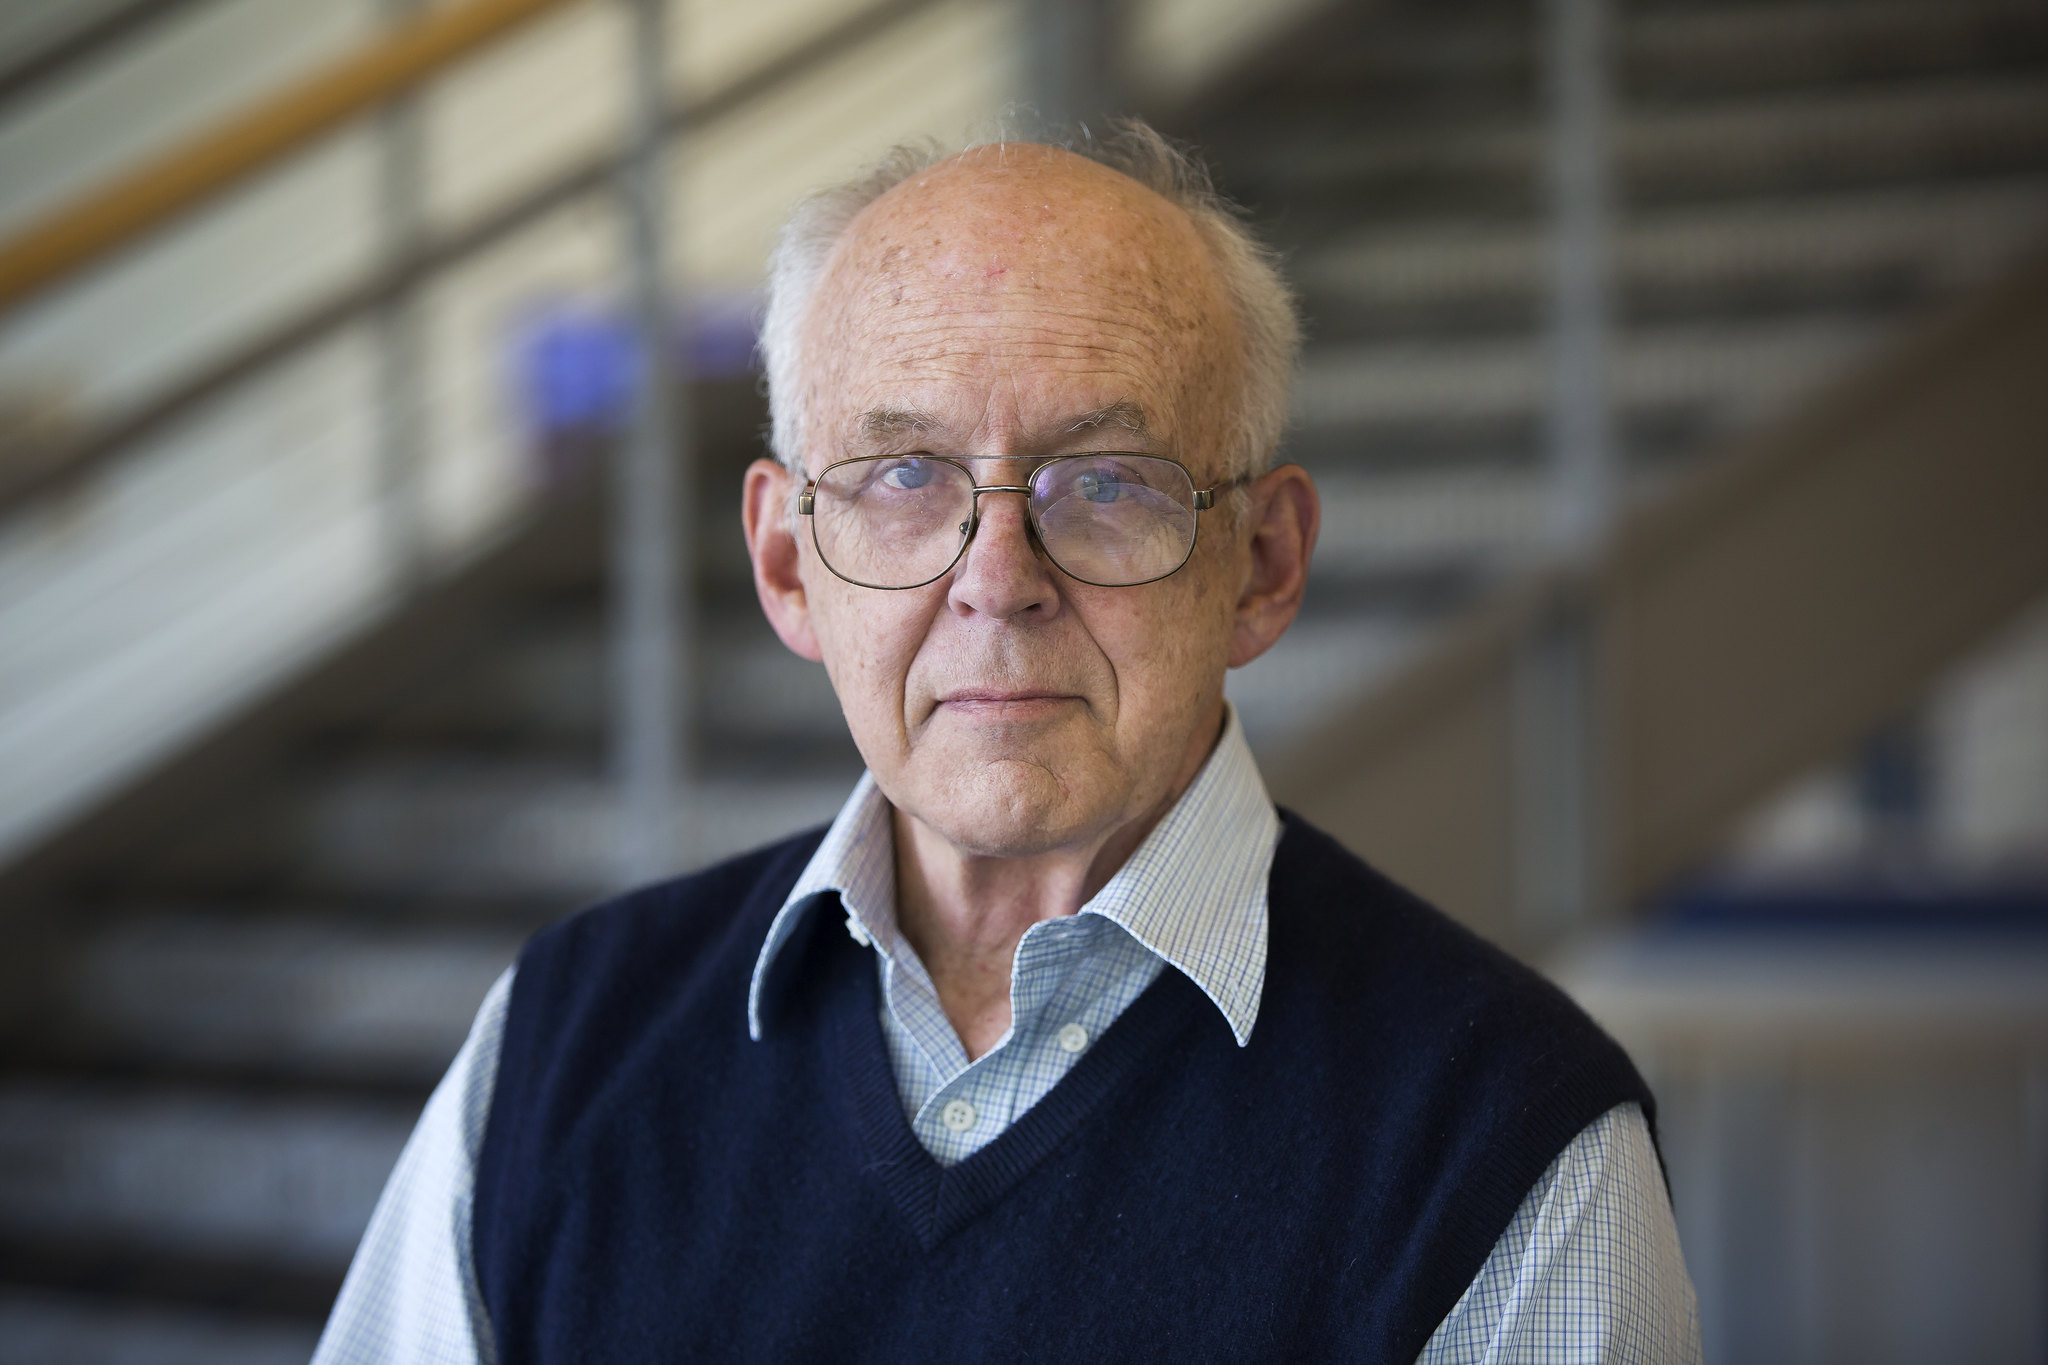 Professor Edward Larsen